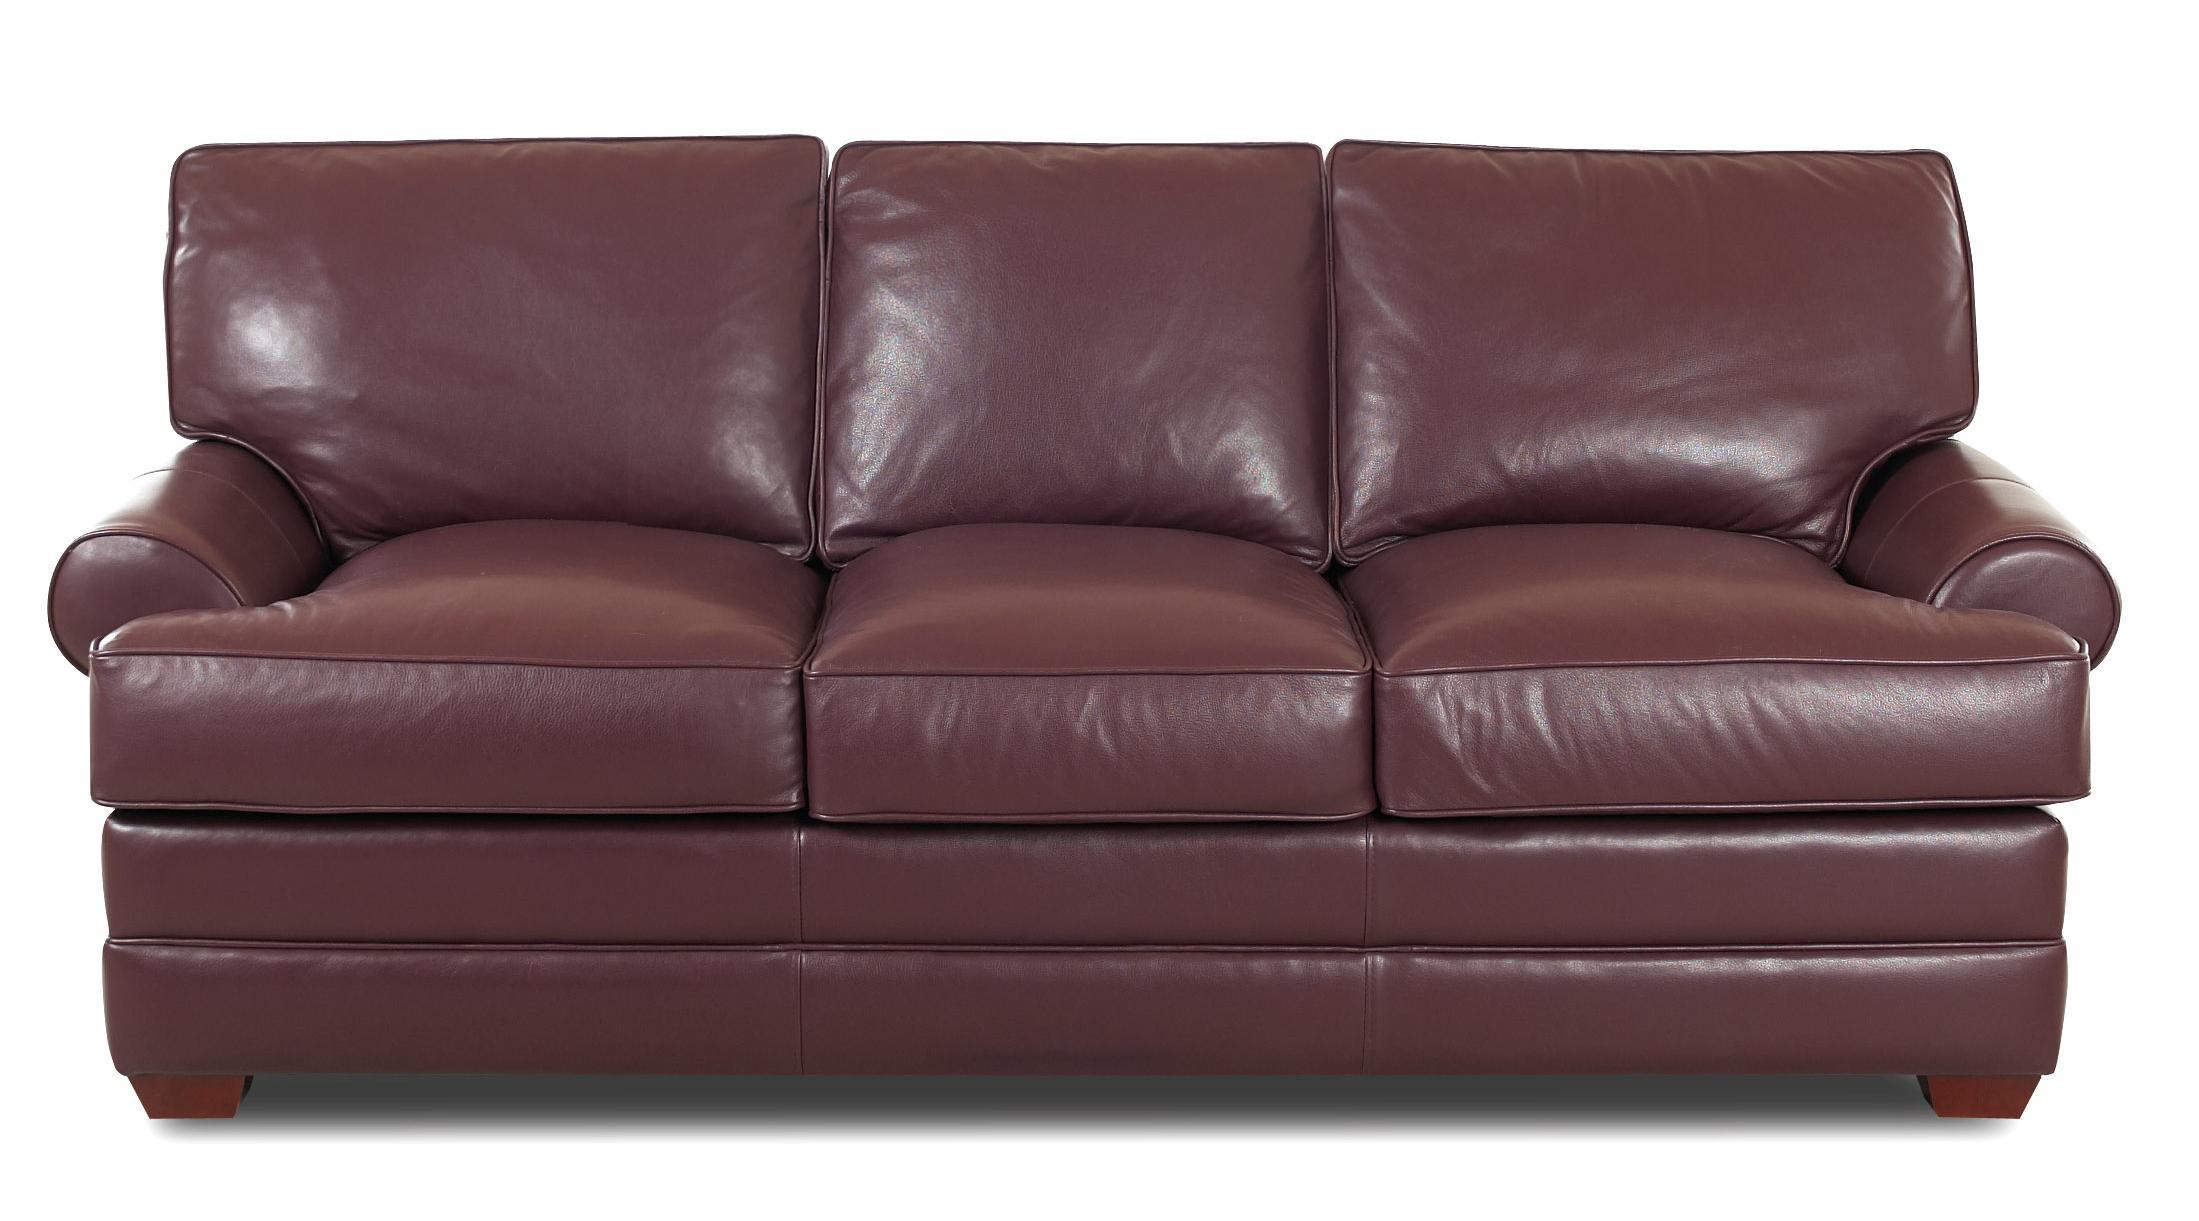 Troupe Sofa by Klaussner at Pilgrim Furniture City